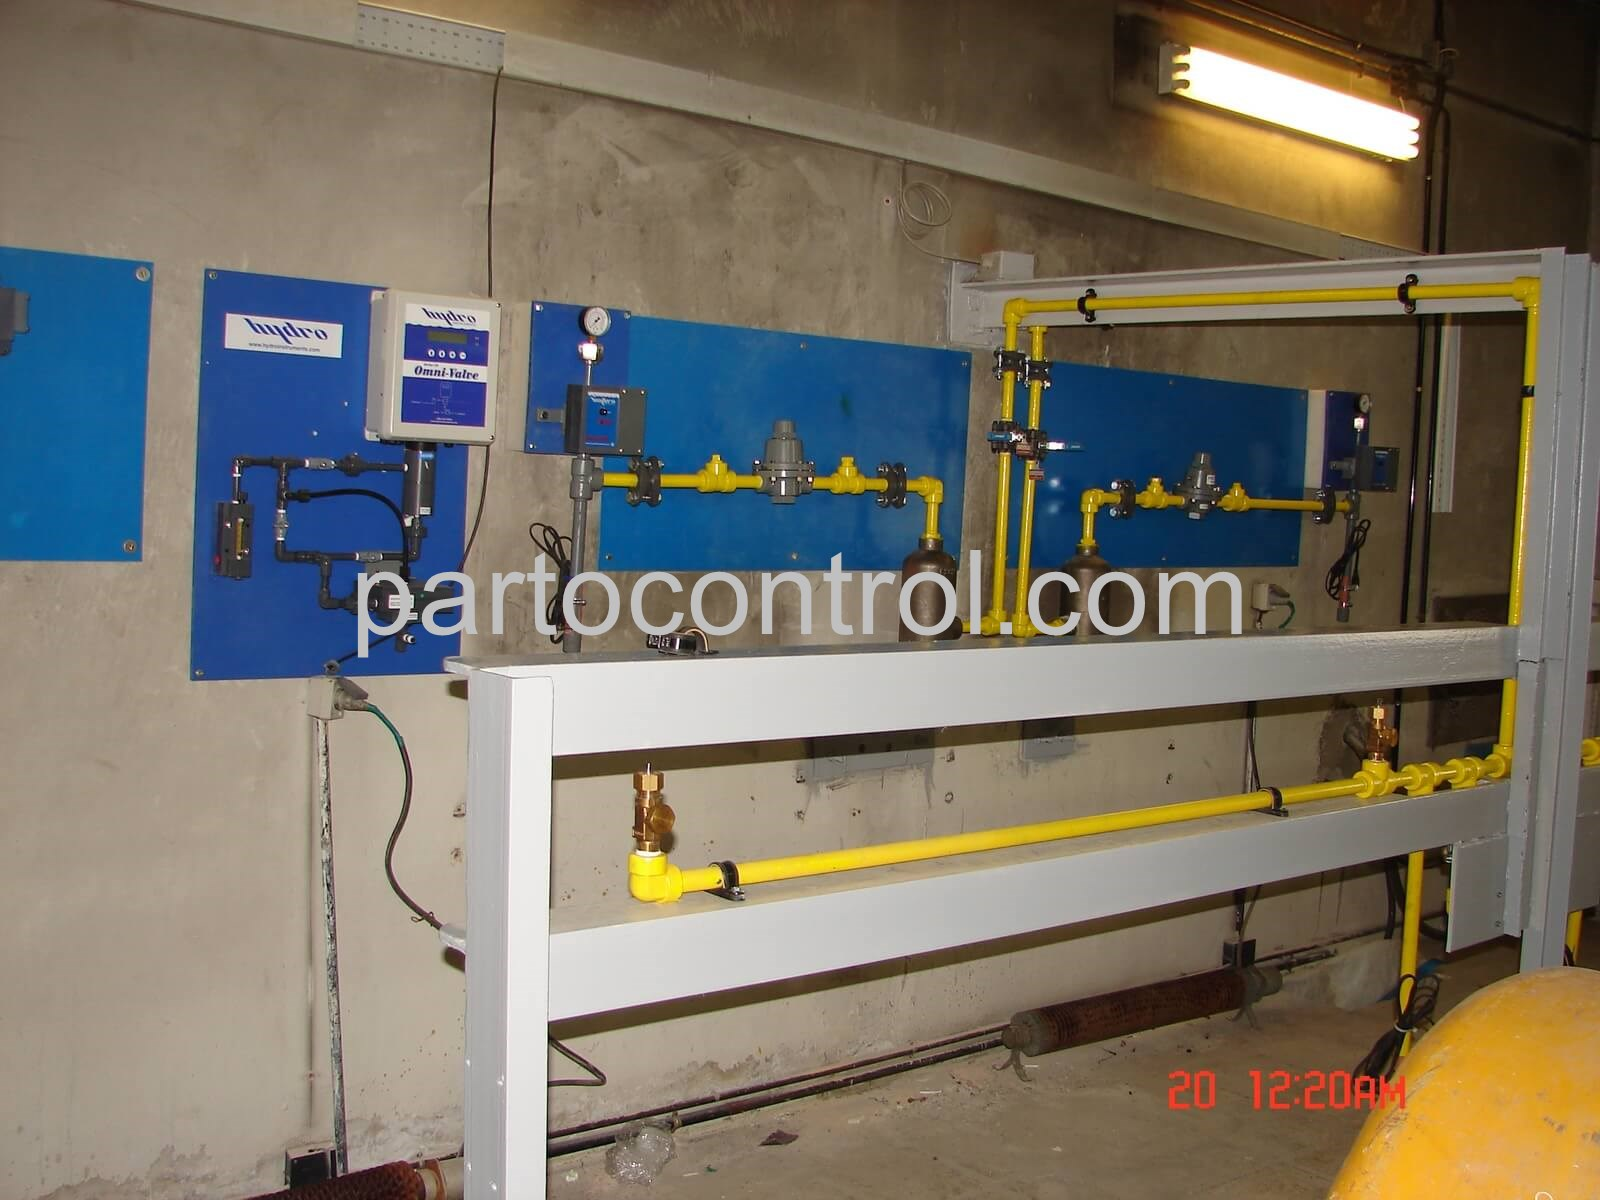 Ferdows gase chlorineکلرزن گازی فردوس3 - پروژه کلرزن گازی